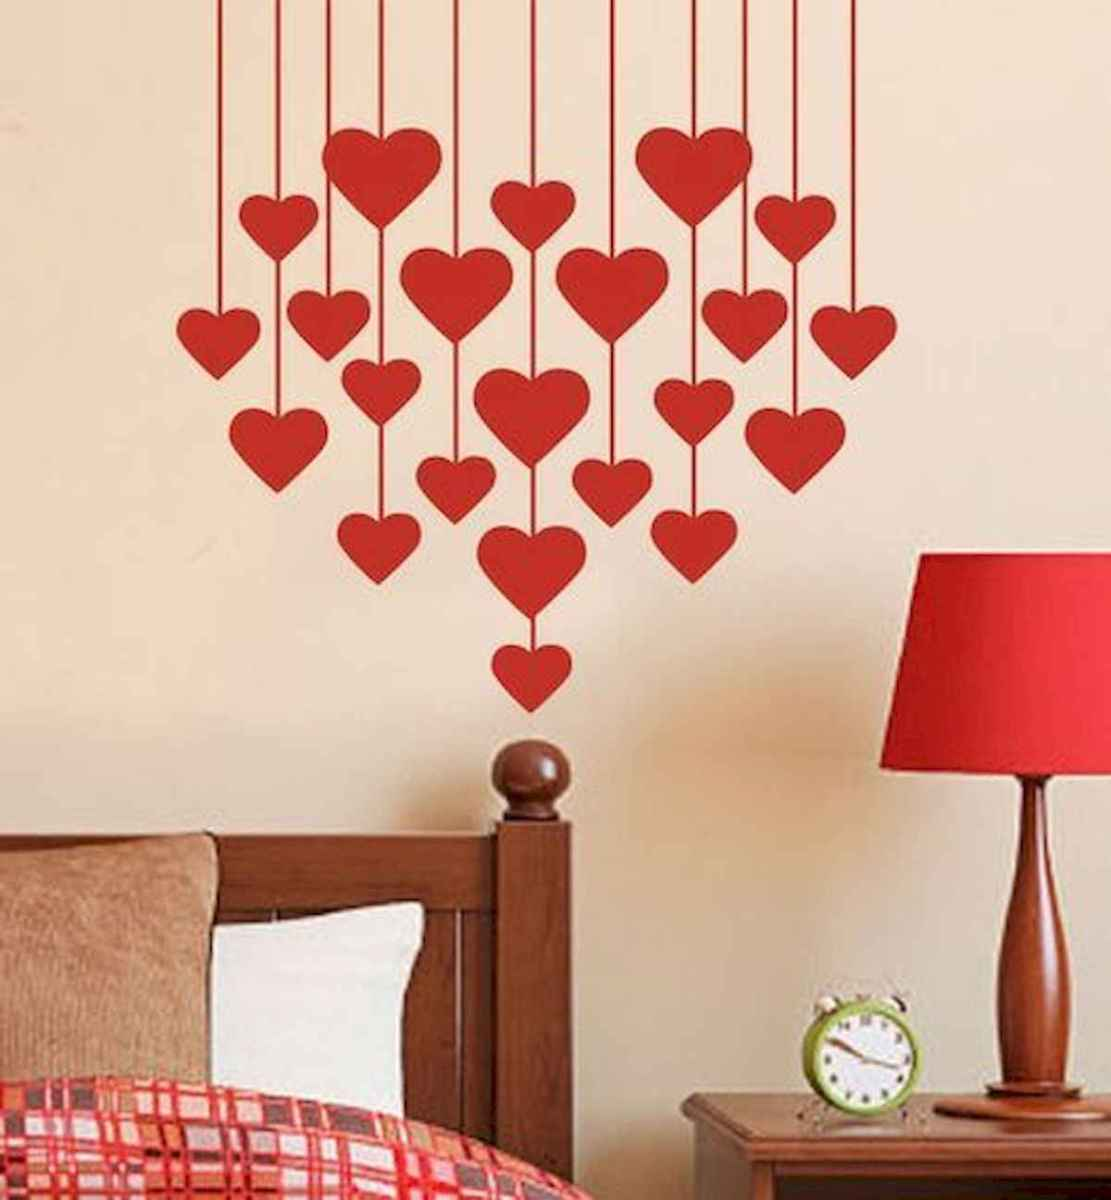 50 stunning valentines day decor ideas (12)